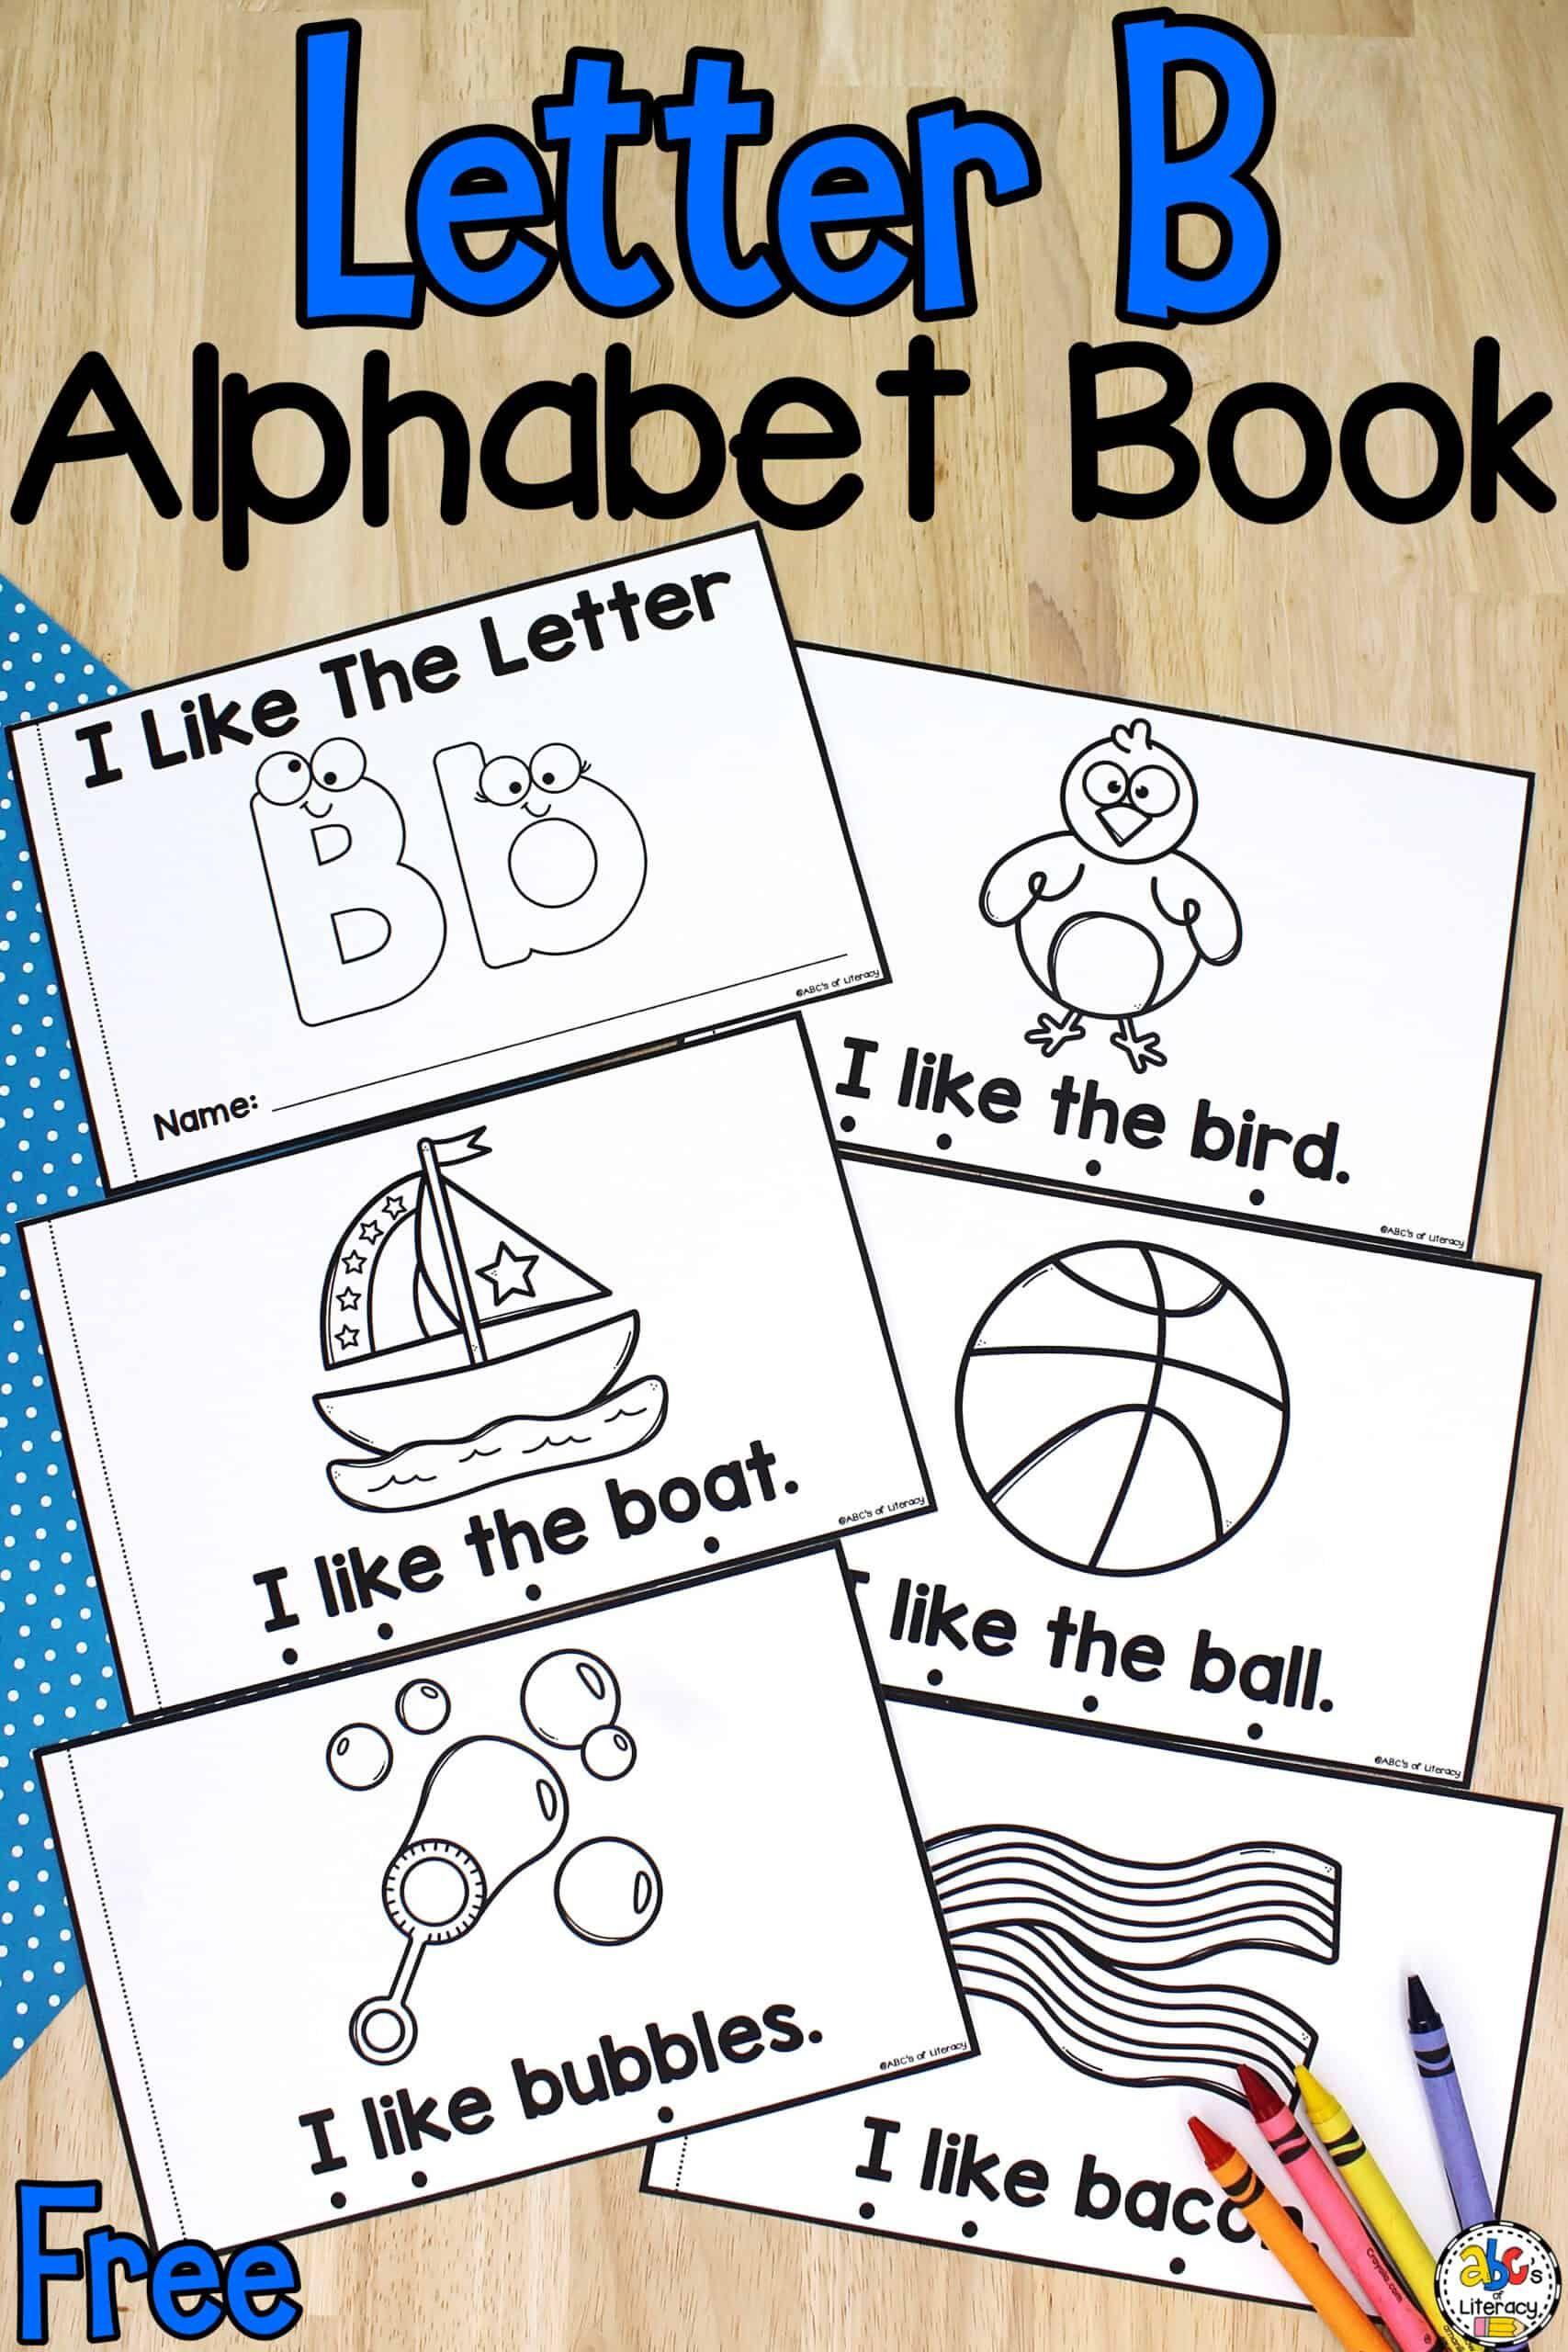 Letter B Book Letter Recognition Activitiy For Pre